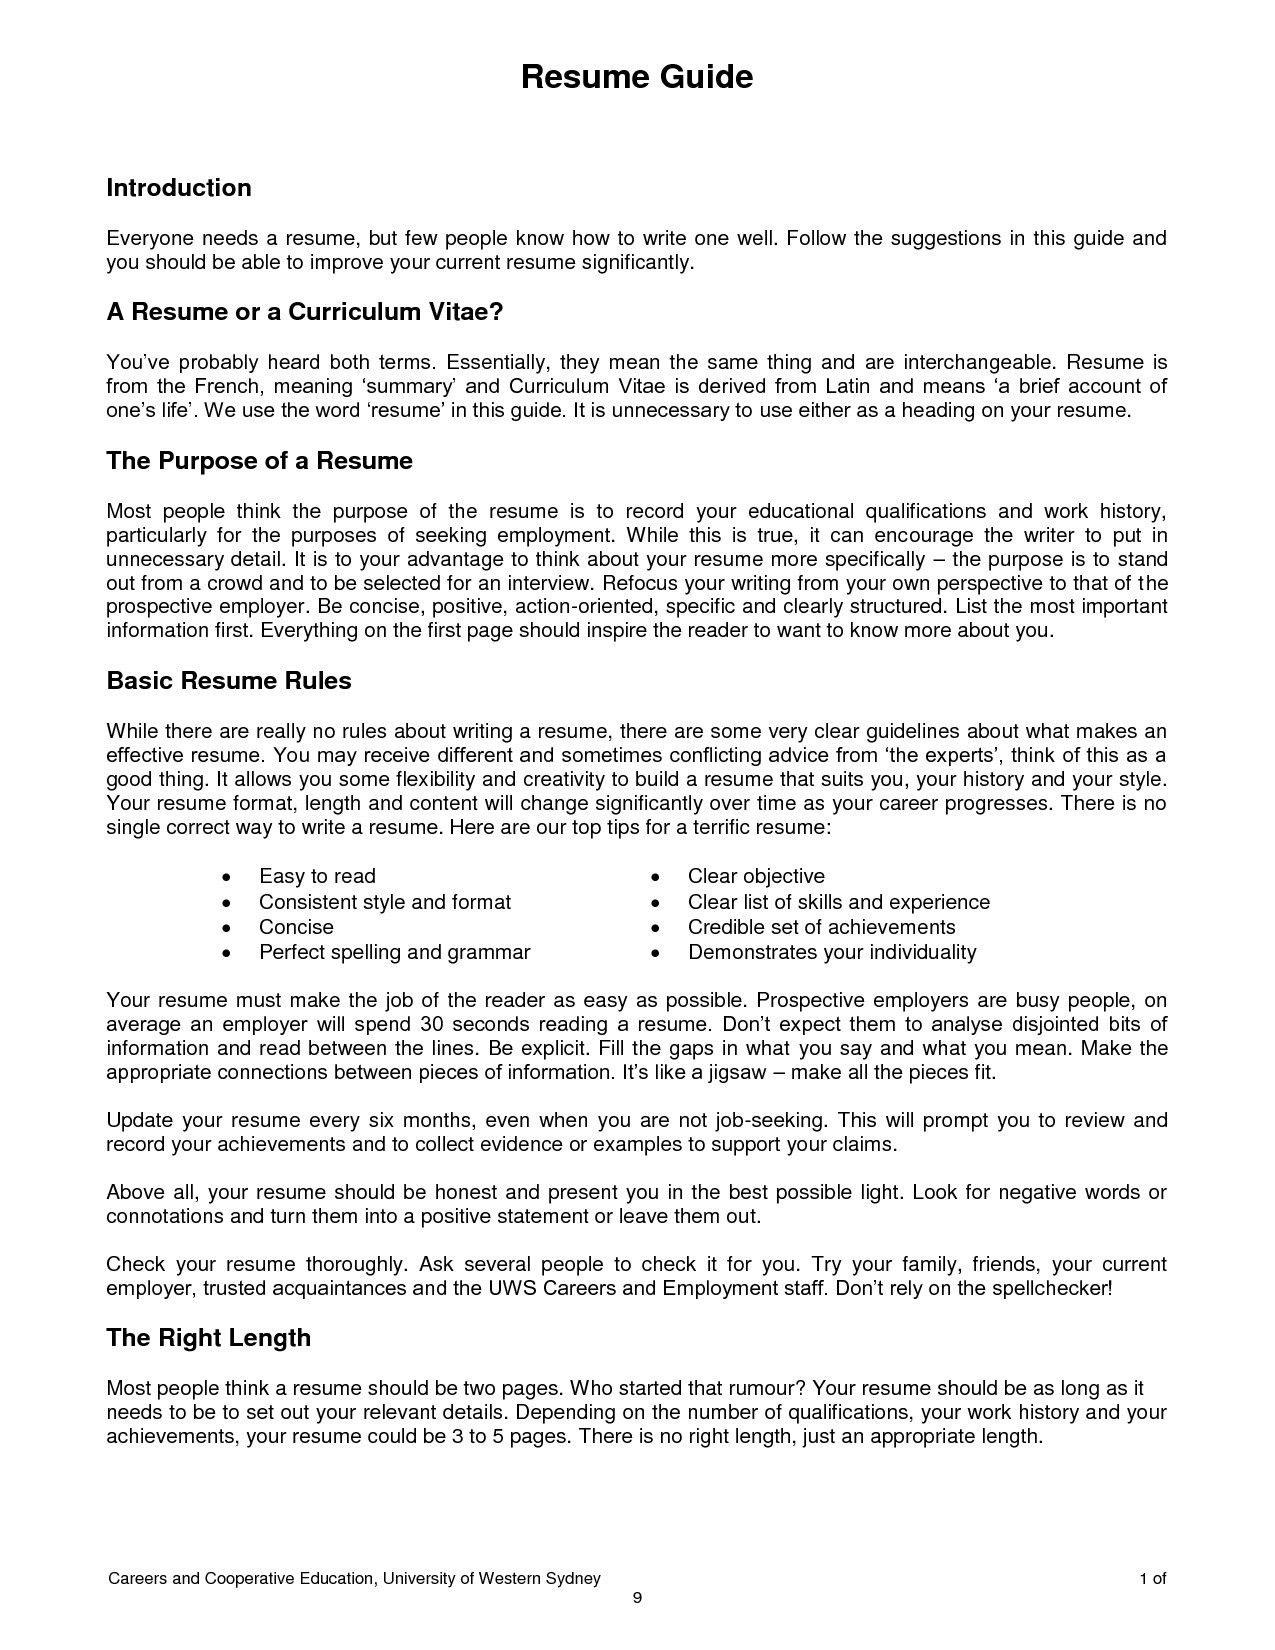 Carbon Transfer Through Snails And Elodea Worksheet